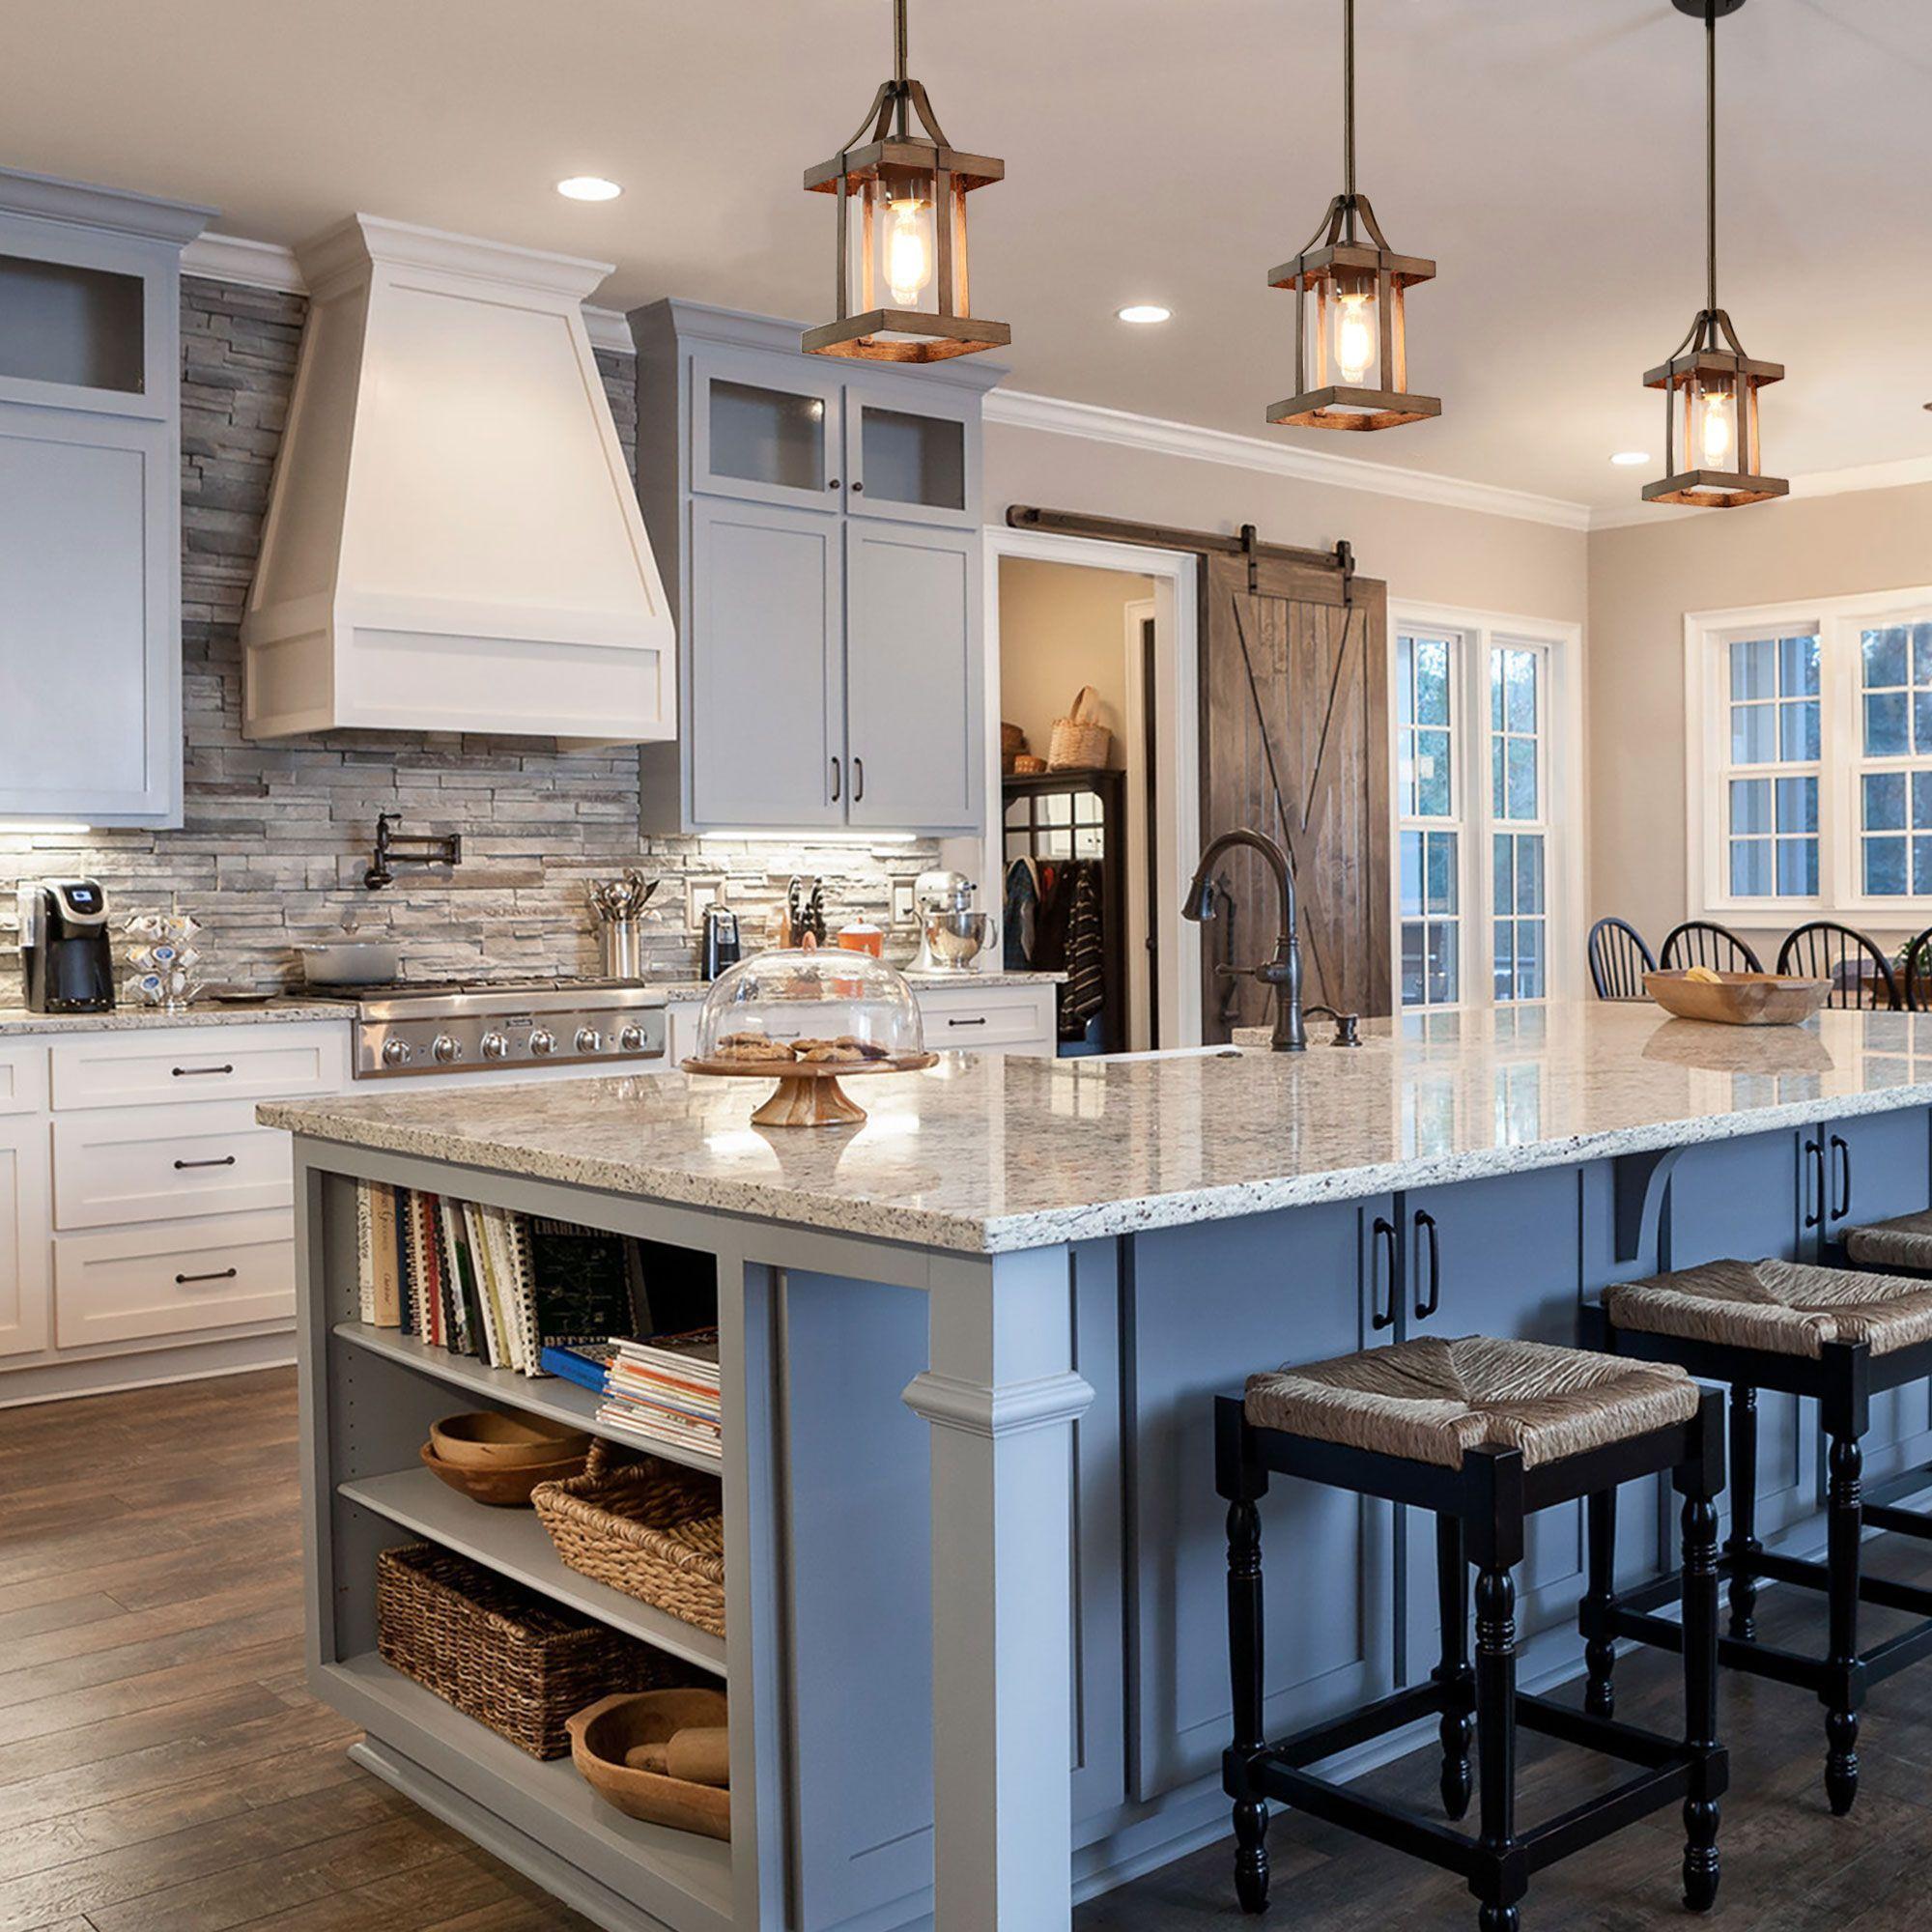 50 Unique Small Kitchen Ideas That You Ve Never Seen: Modern Farmhouse Kitchens